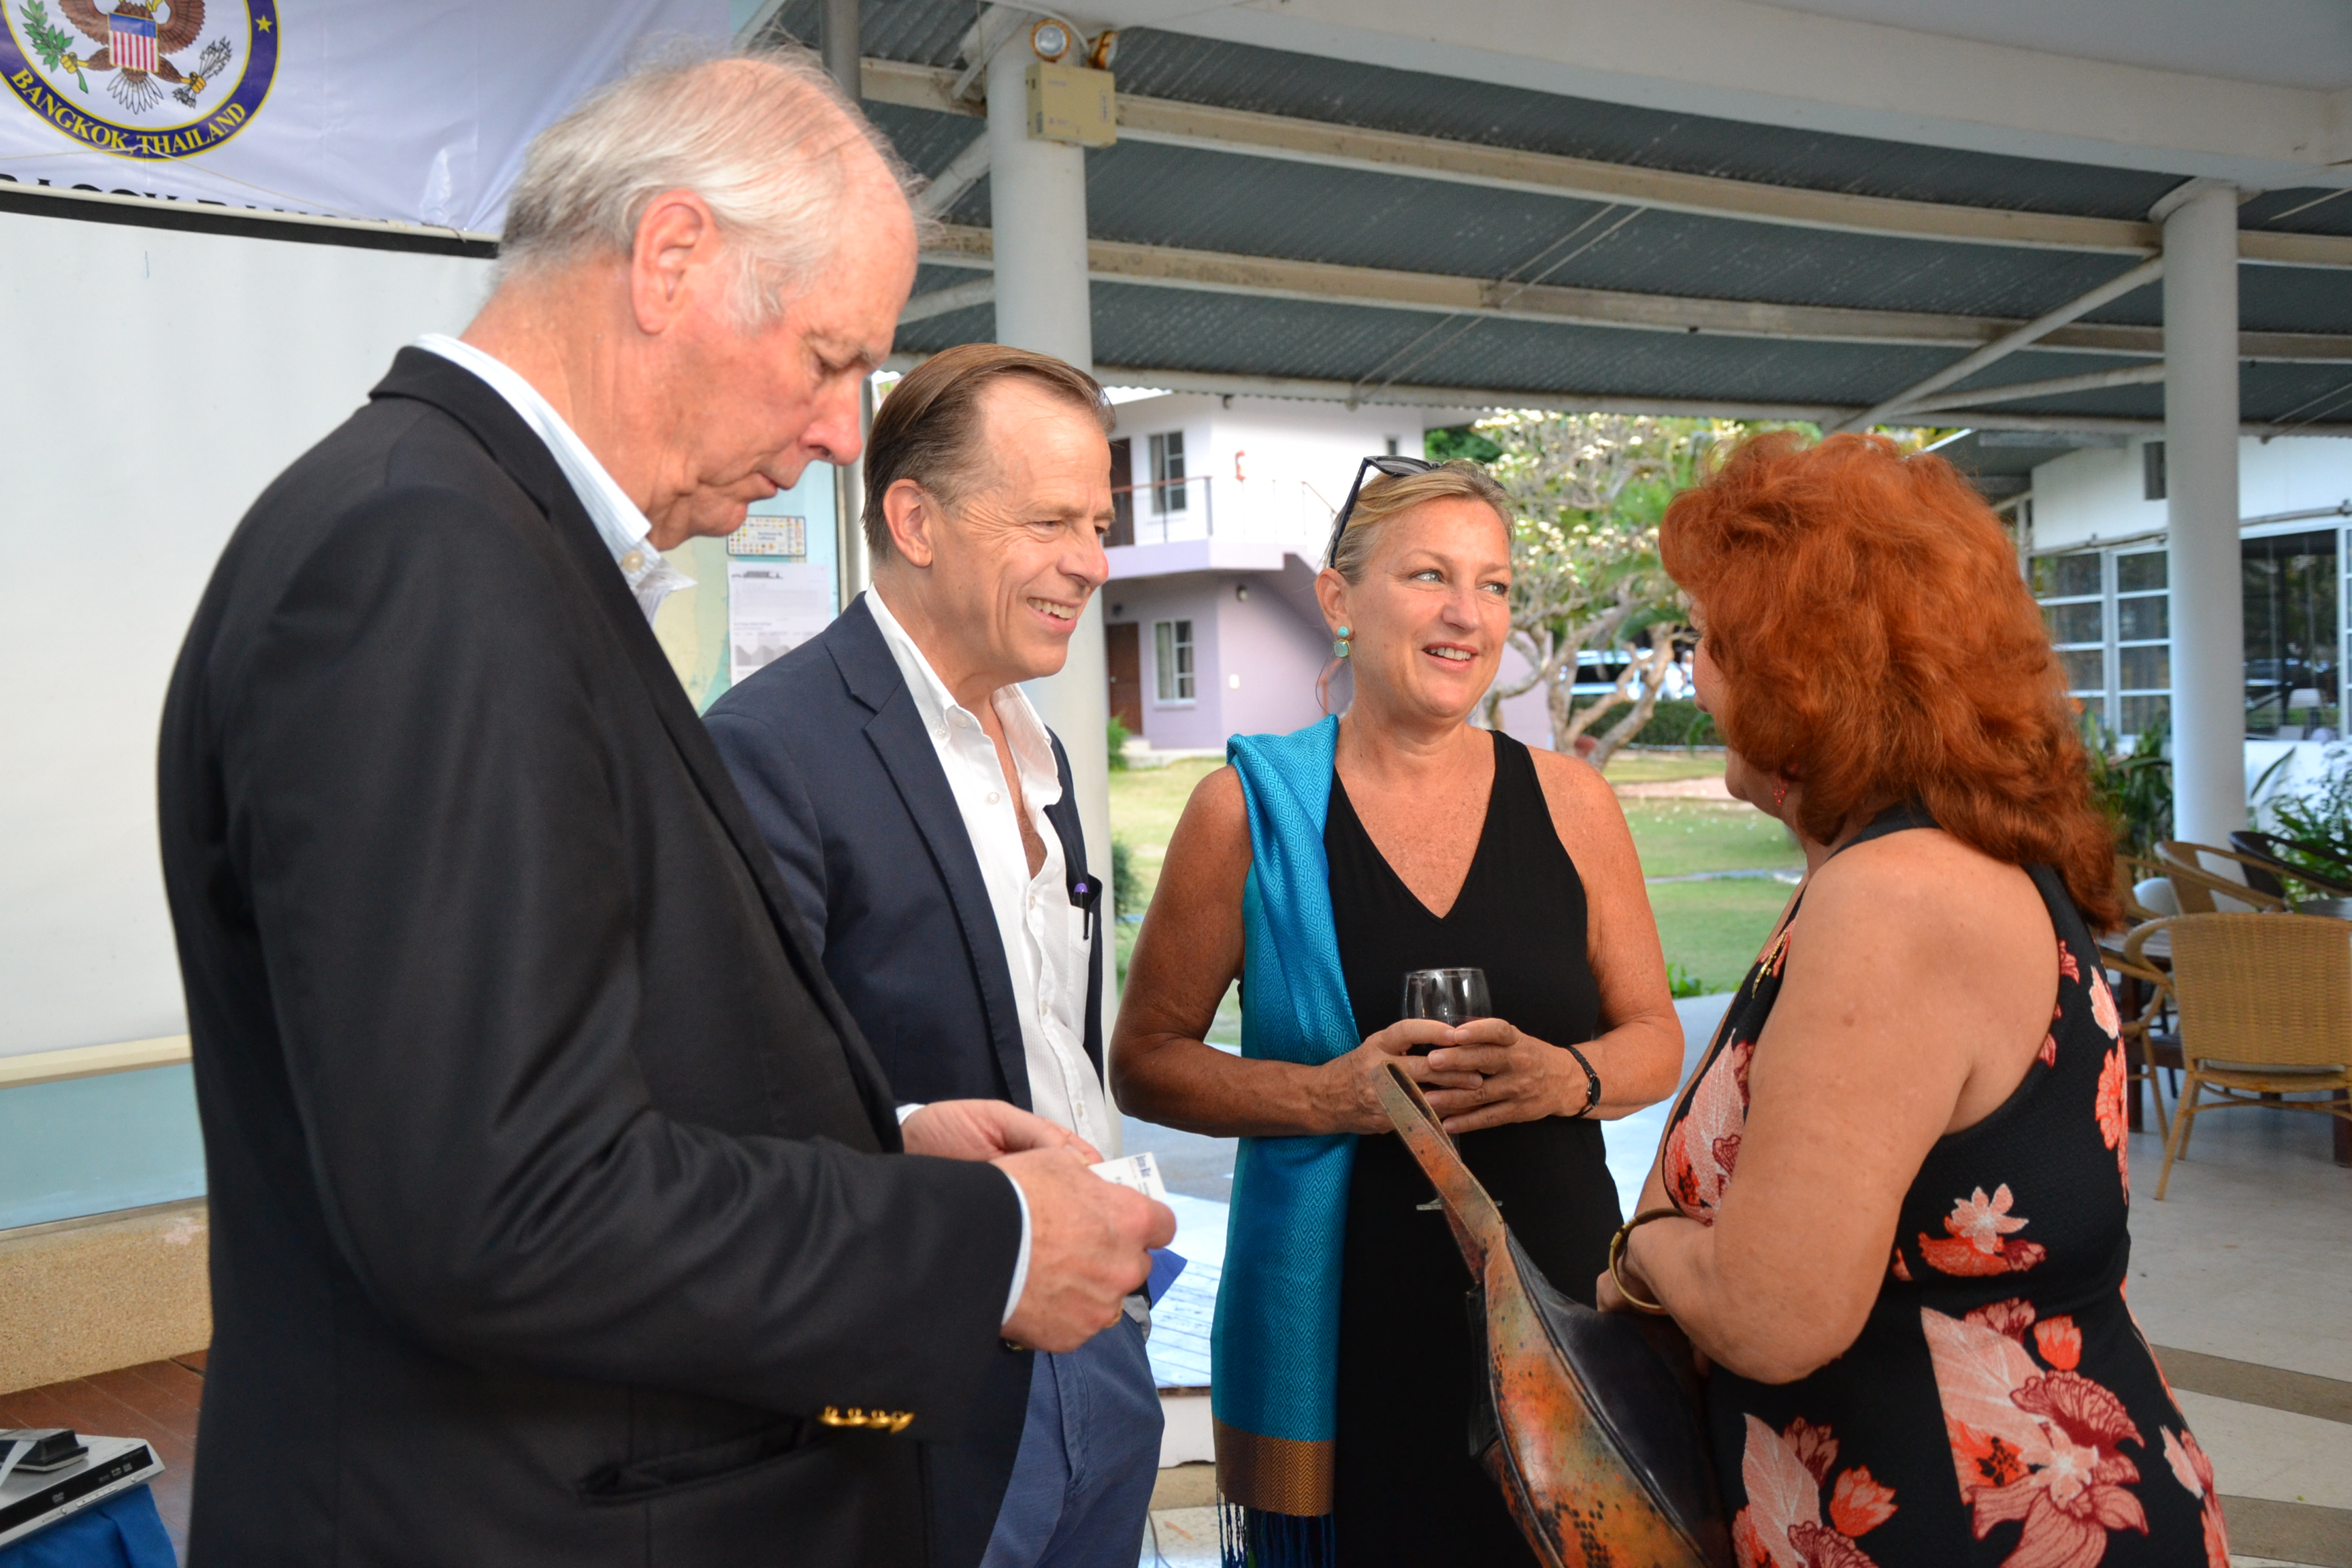 The ambassador greets Elfi Seitz, editor of the Pattaya Blatt.